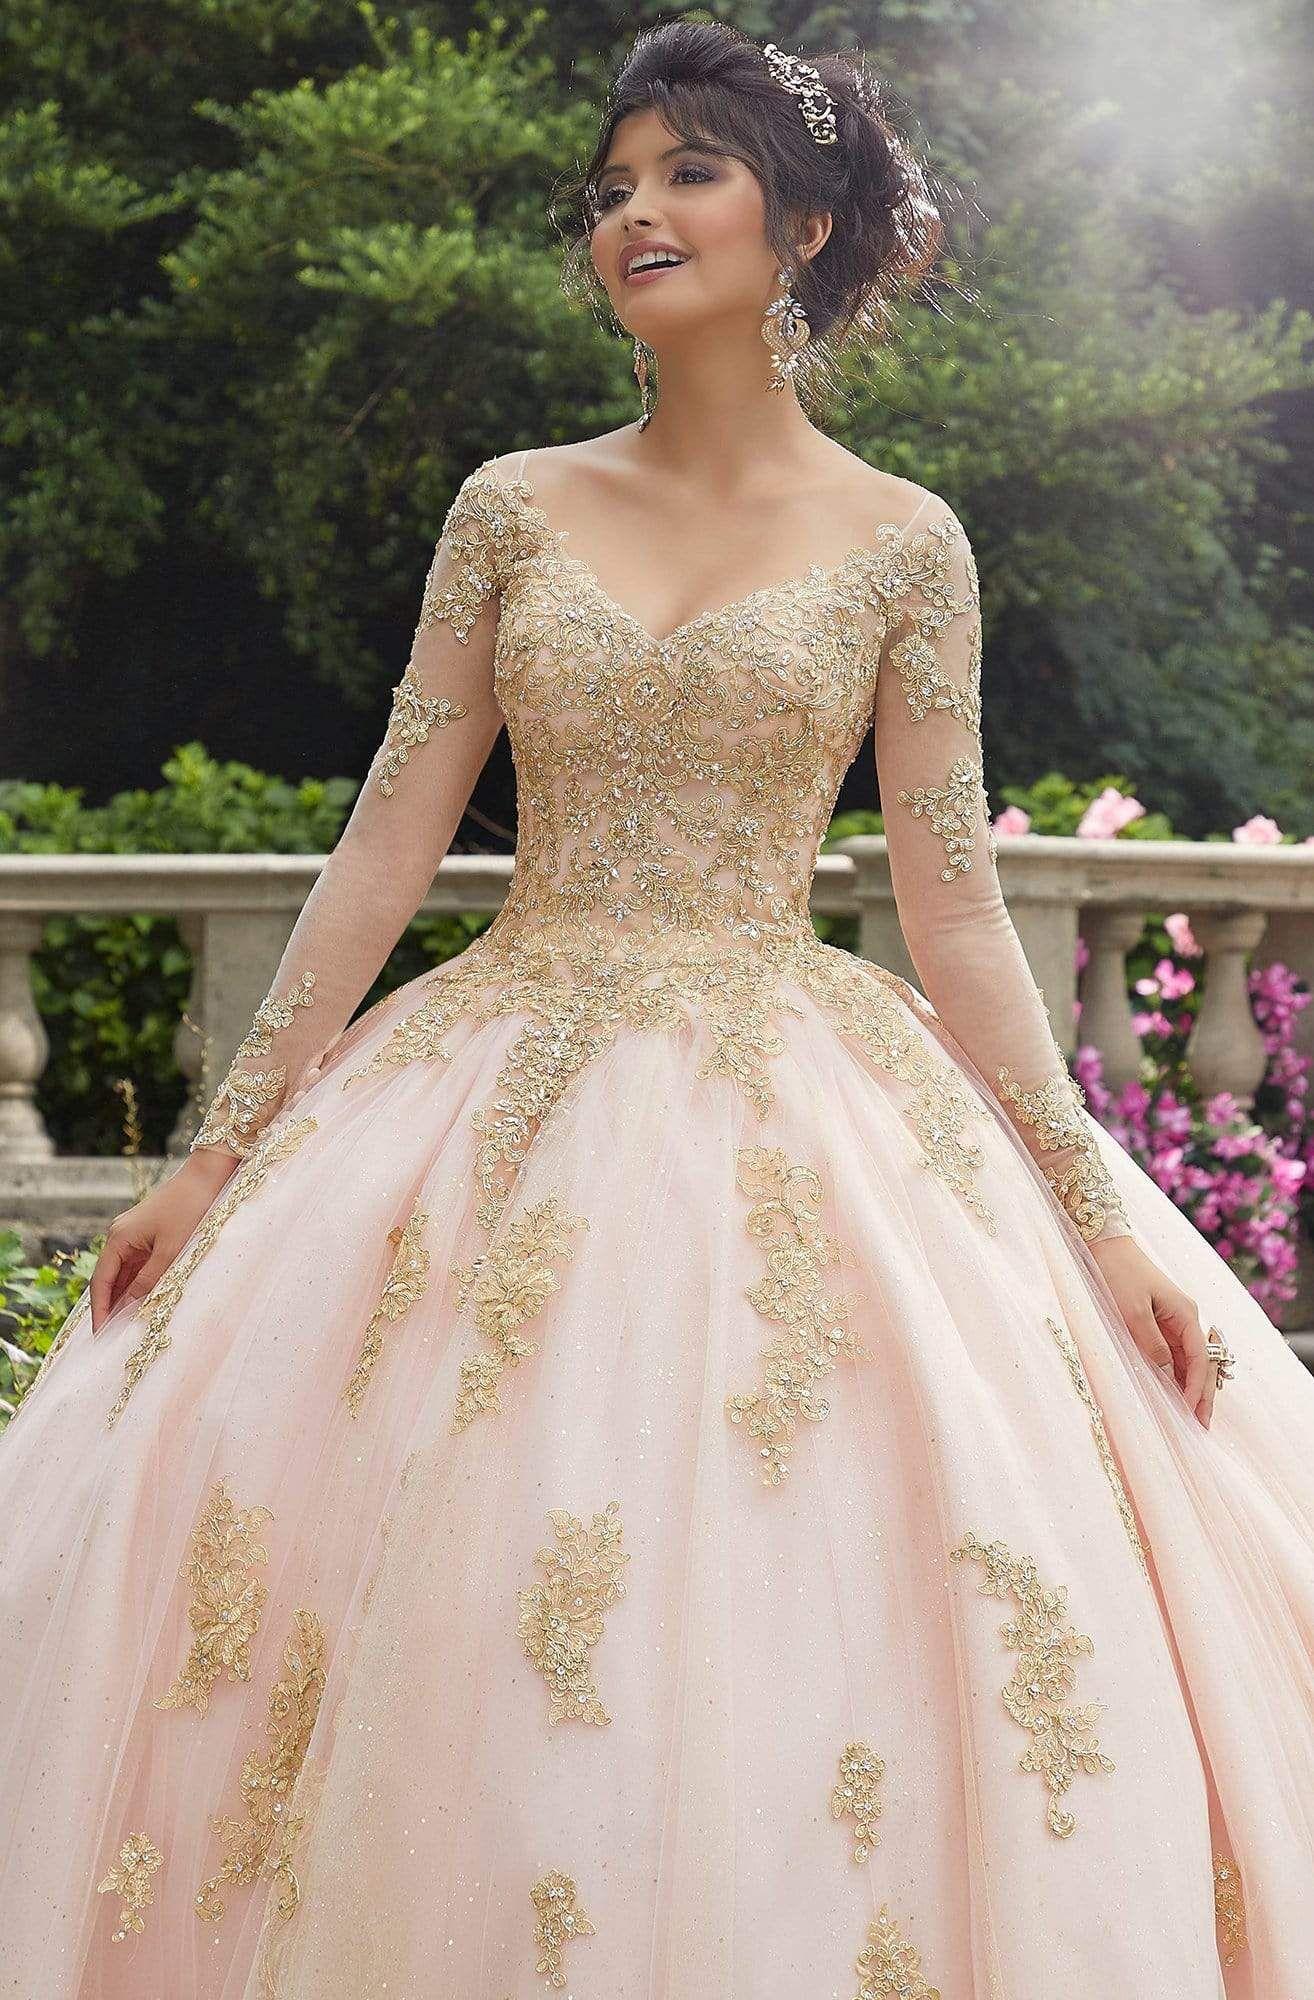 Vizcaya By Mori Lee 89272 Metallic Lace Long Sleeves Ballgown In 2021 Long Sleeve Quinceanera Dresses Pretty Quinceanera Dresses Quinceanera Dresses Gold [ 2000 x 1314 Pixel ]